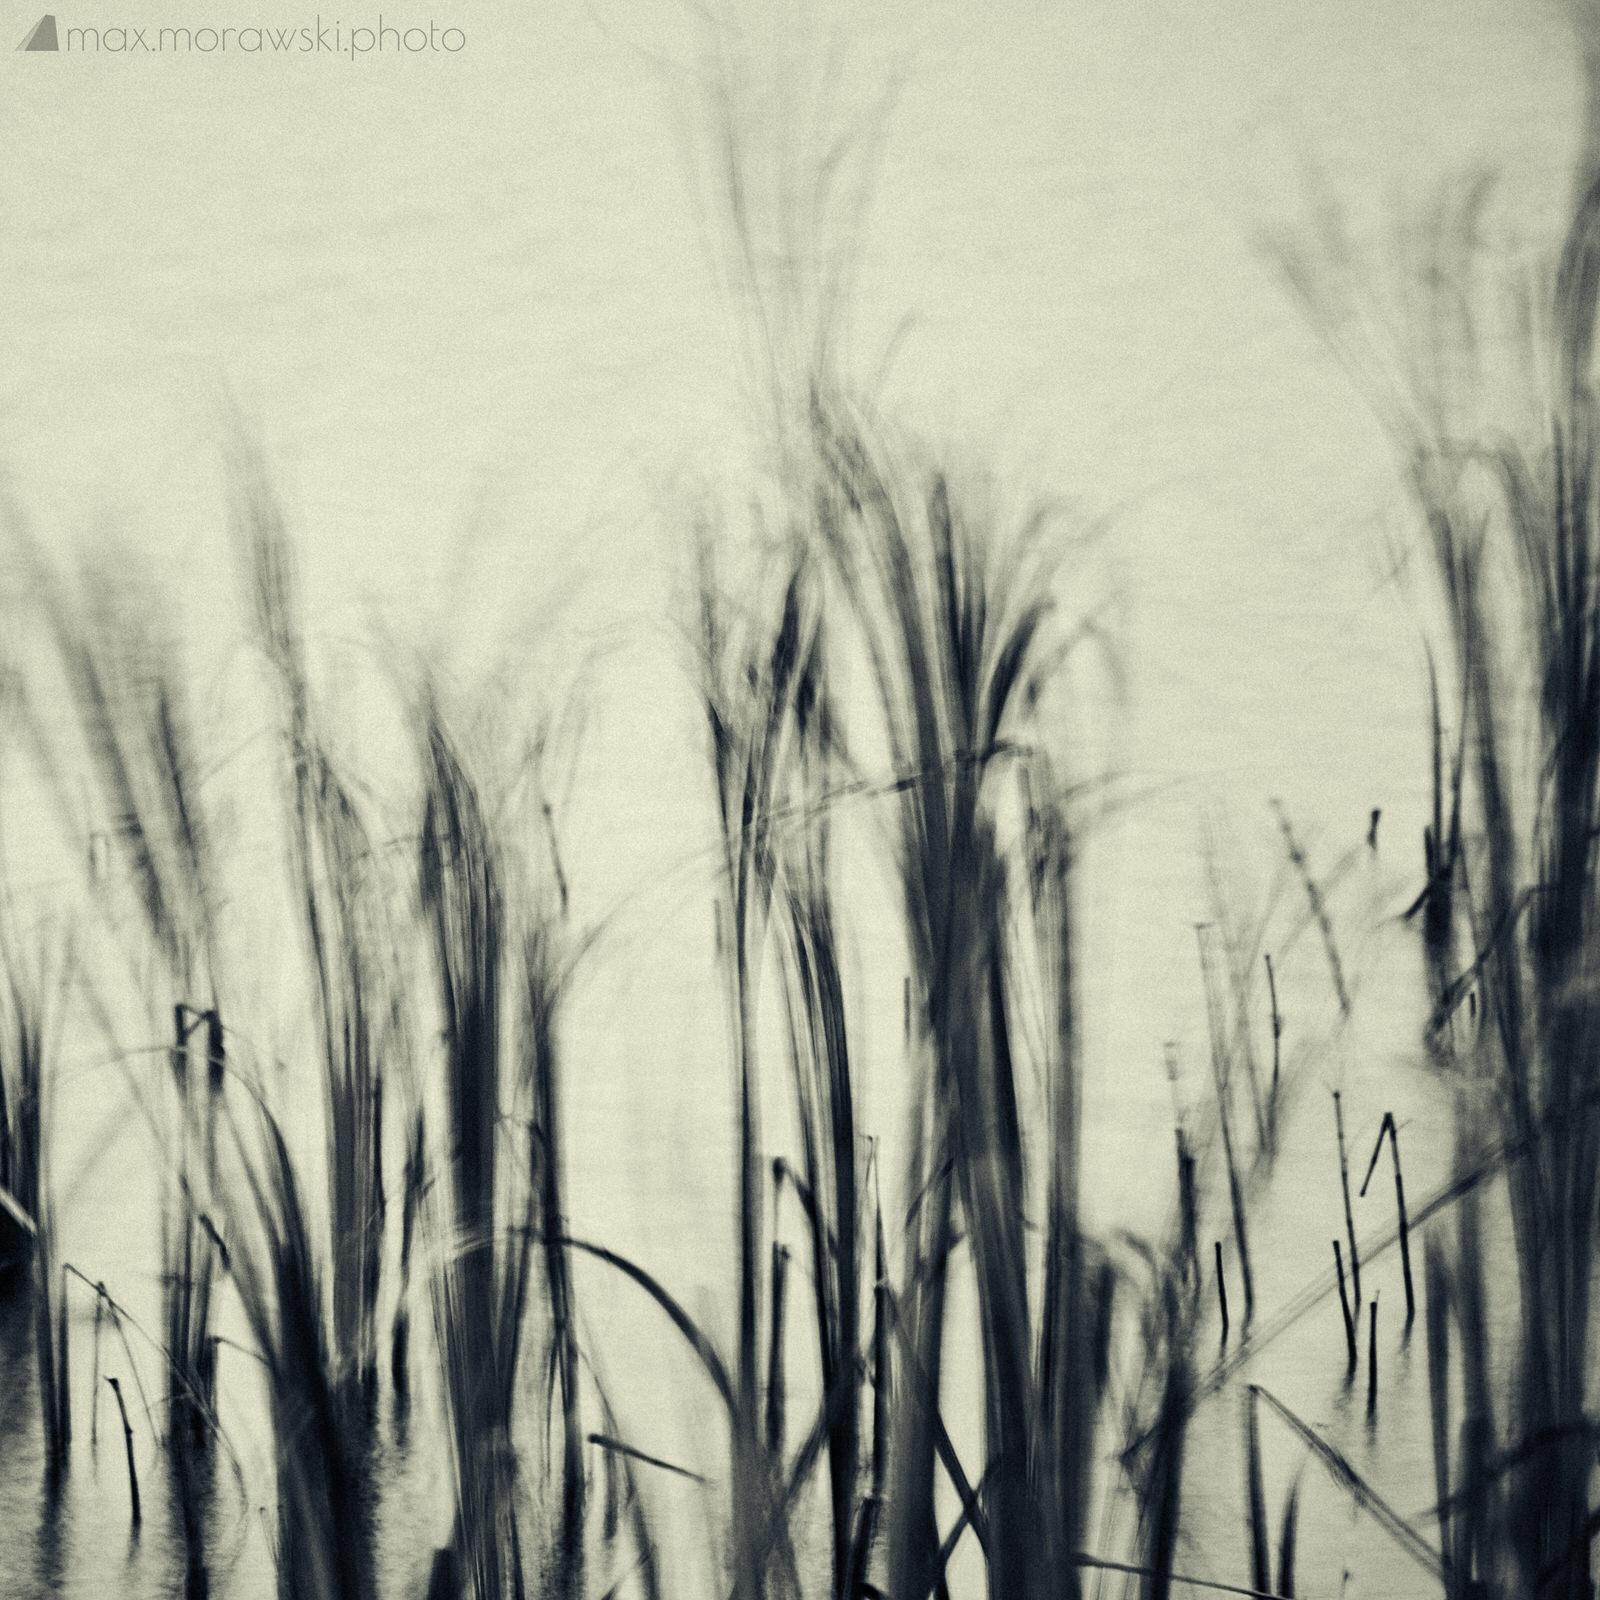 November Reeds; Charcoal study #2